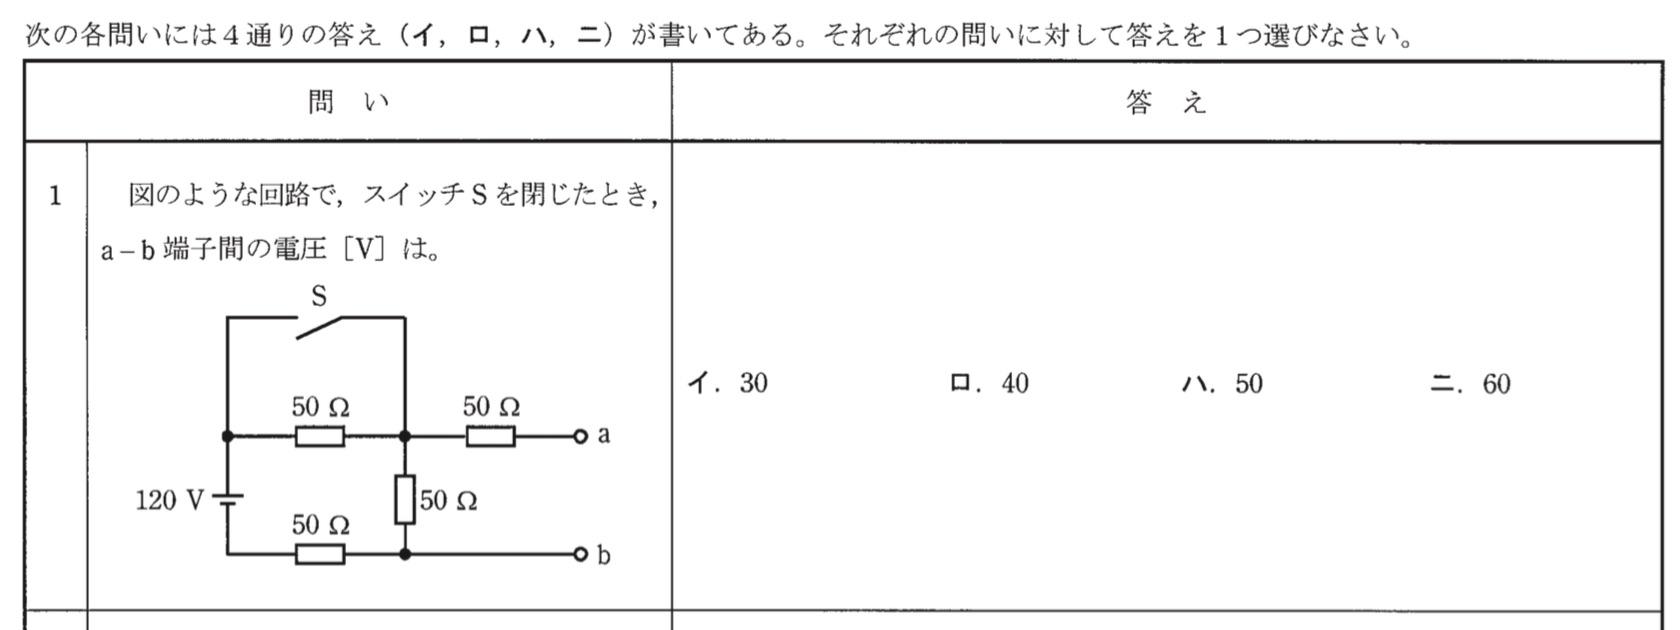 www_shiken_or_jp_answer_pdf_187_file_nm01_2015_K_shimokihikki_pdf.jpg